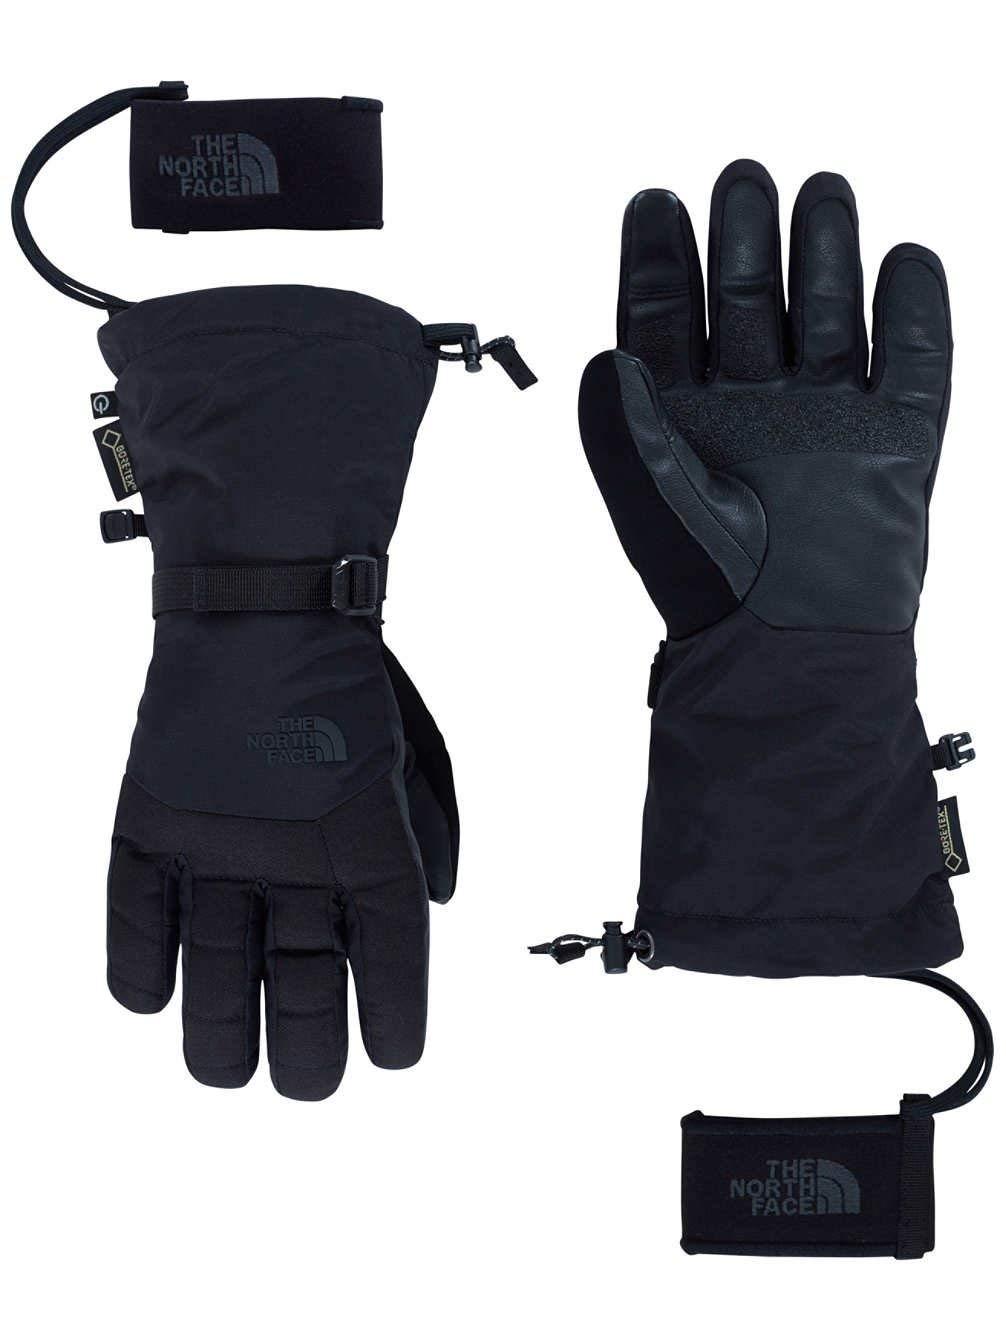 Gants de ski homme   Gants Spyder, Rossignol - PRECISION SKI 89fda091851